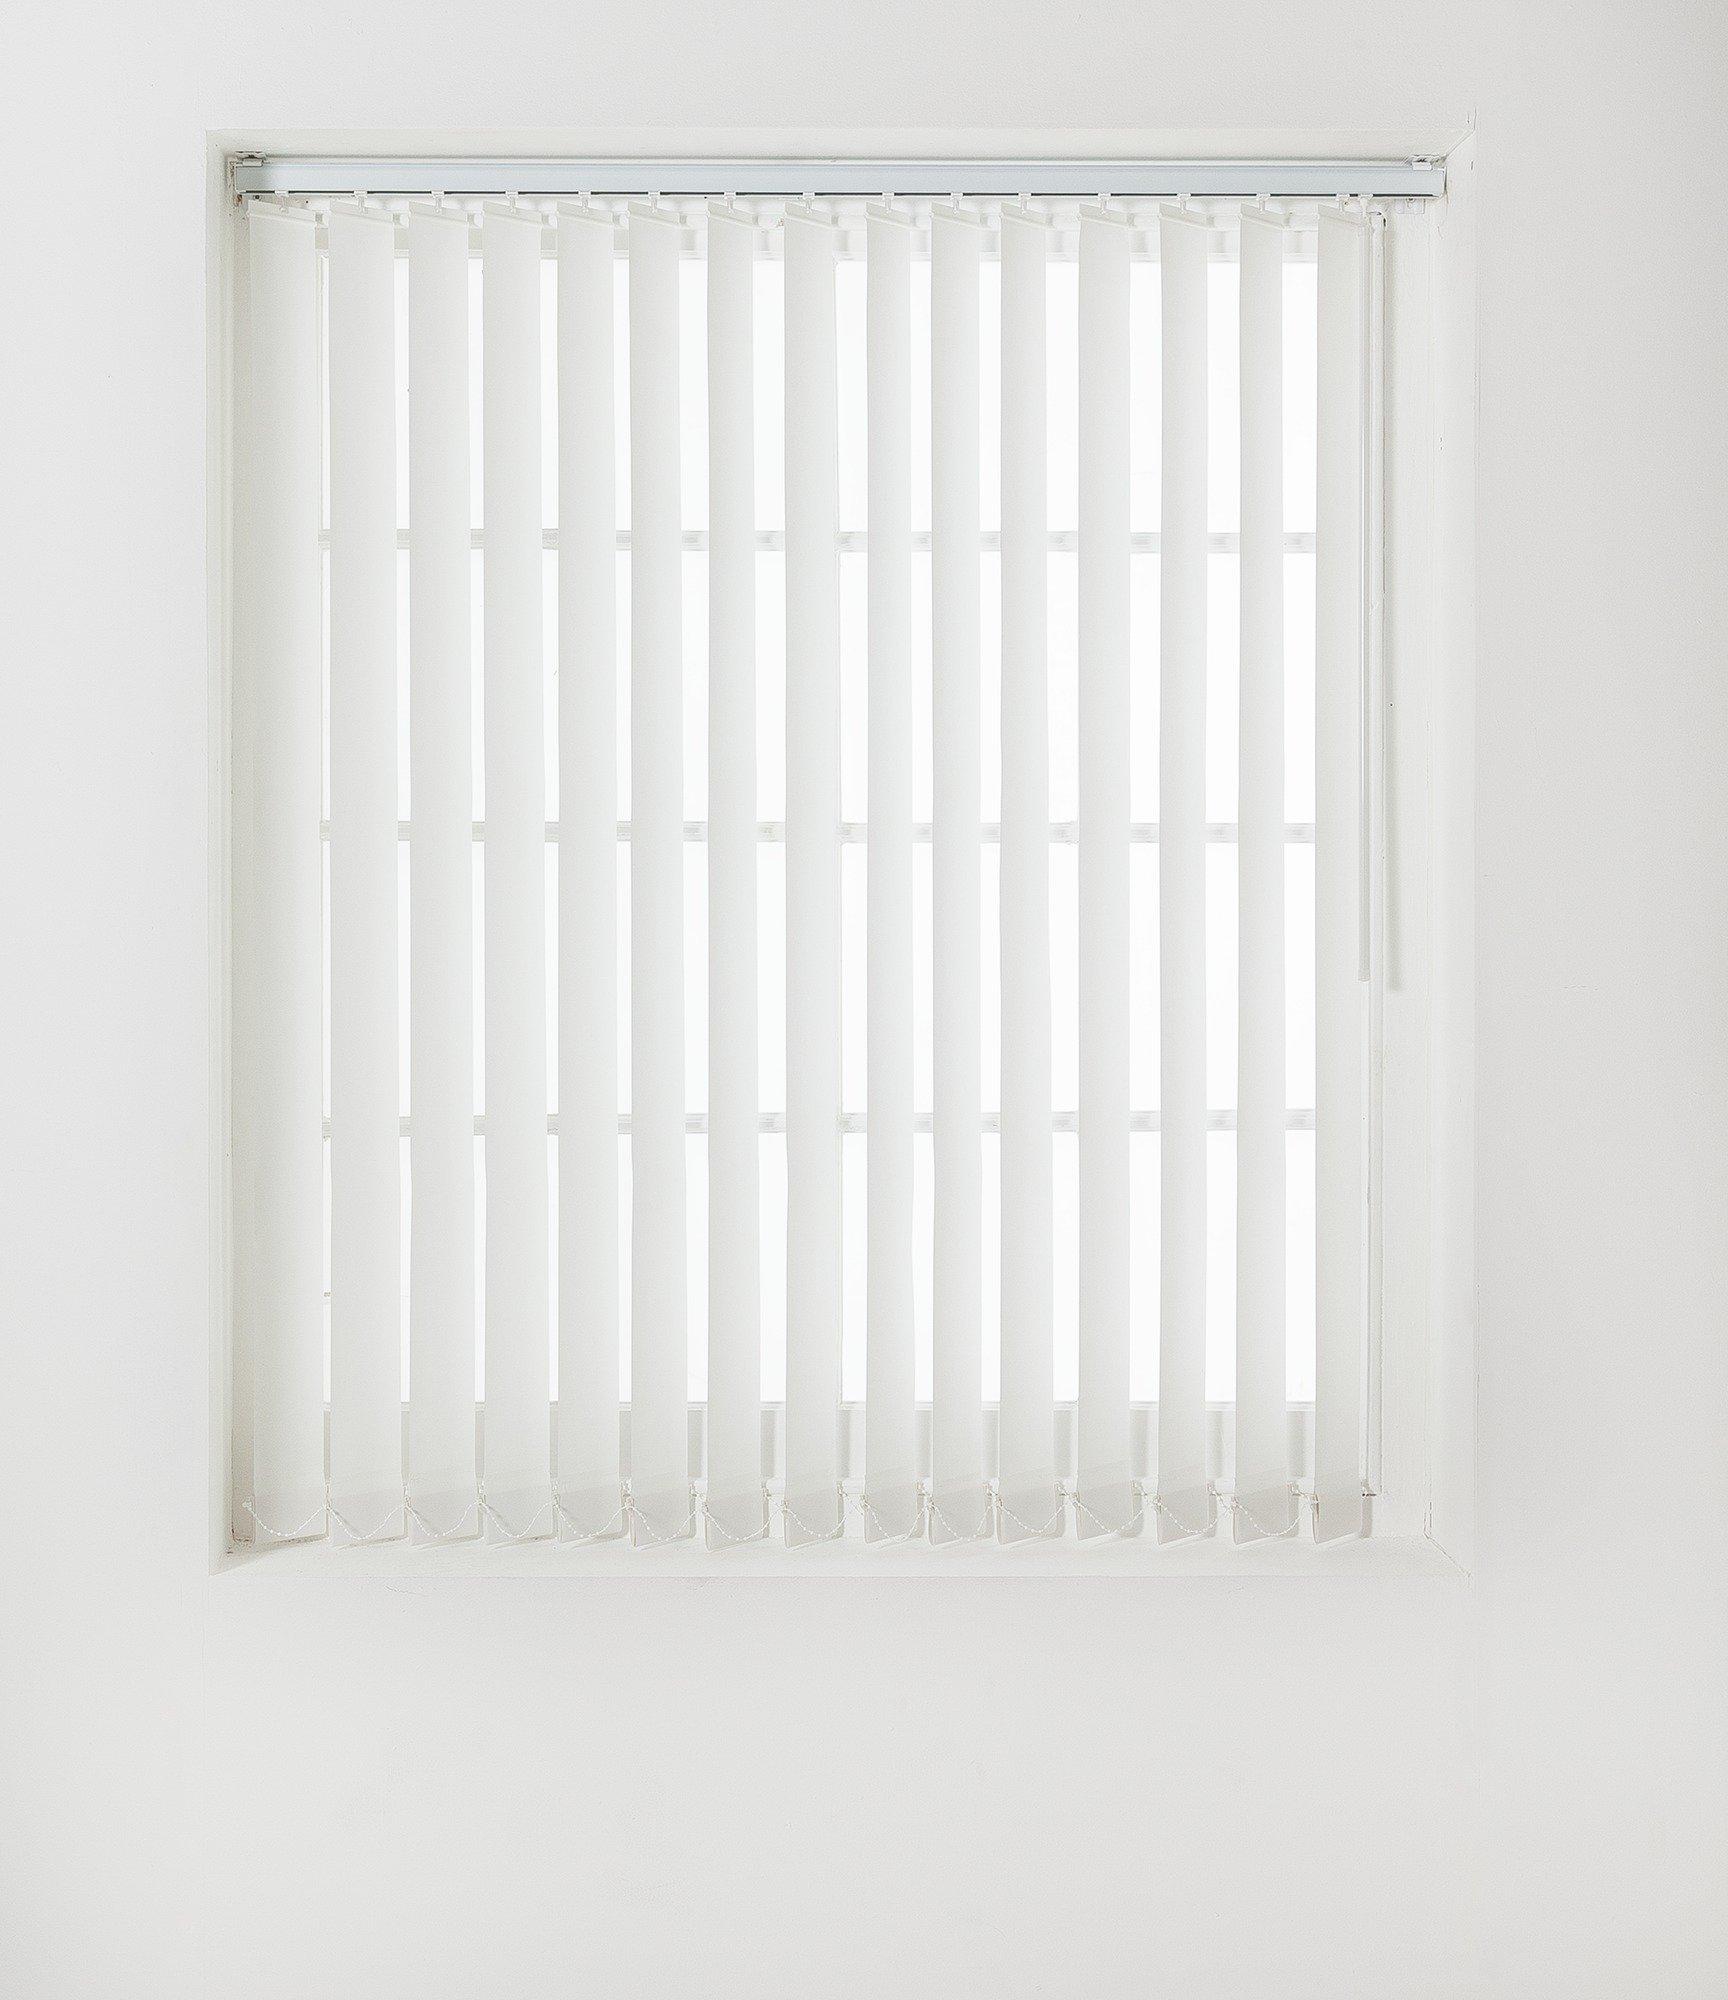 home-vertical-blinds-slat-pack-244x137cm-daylight